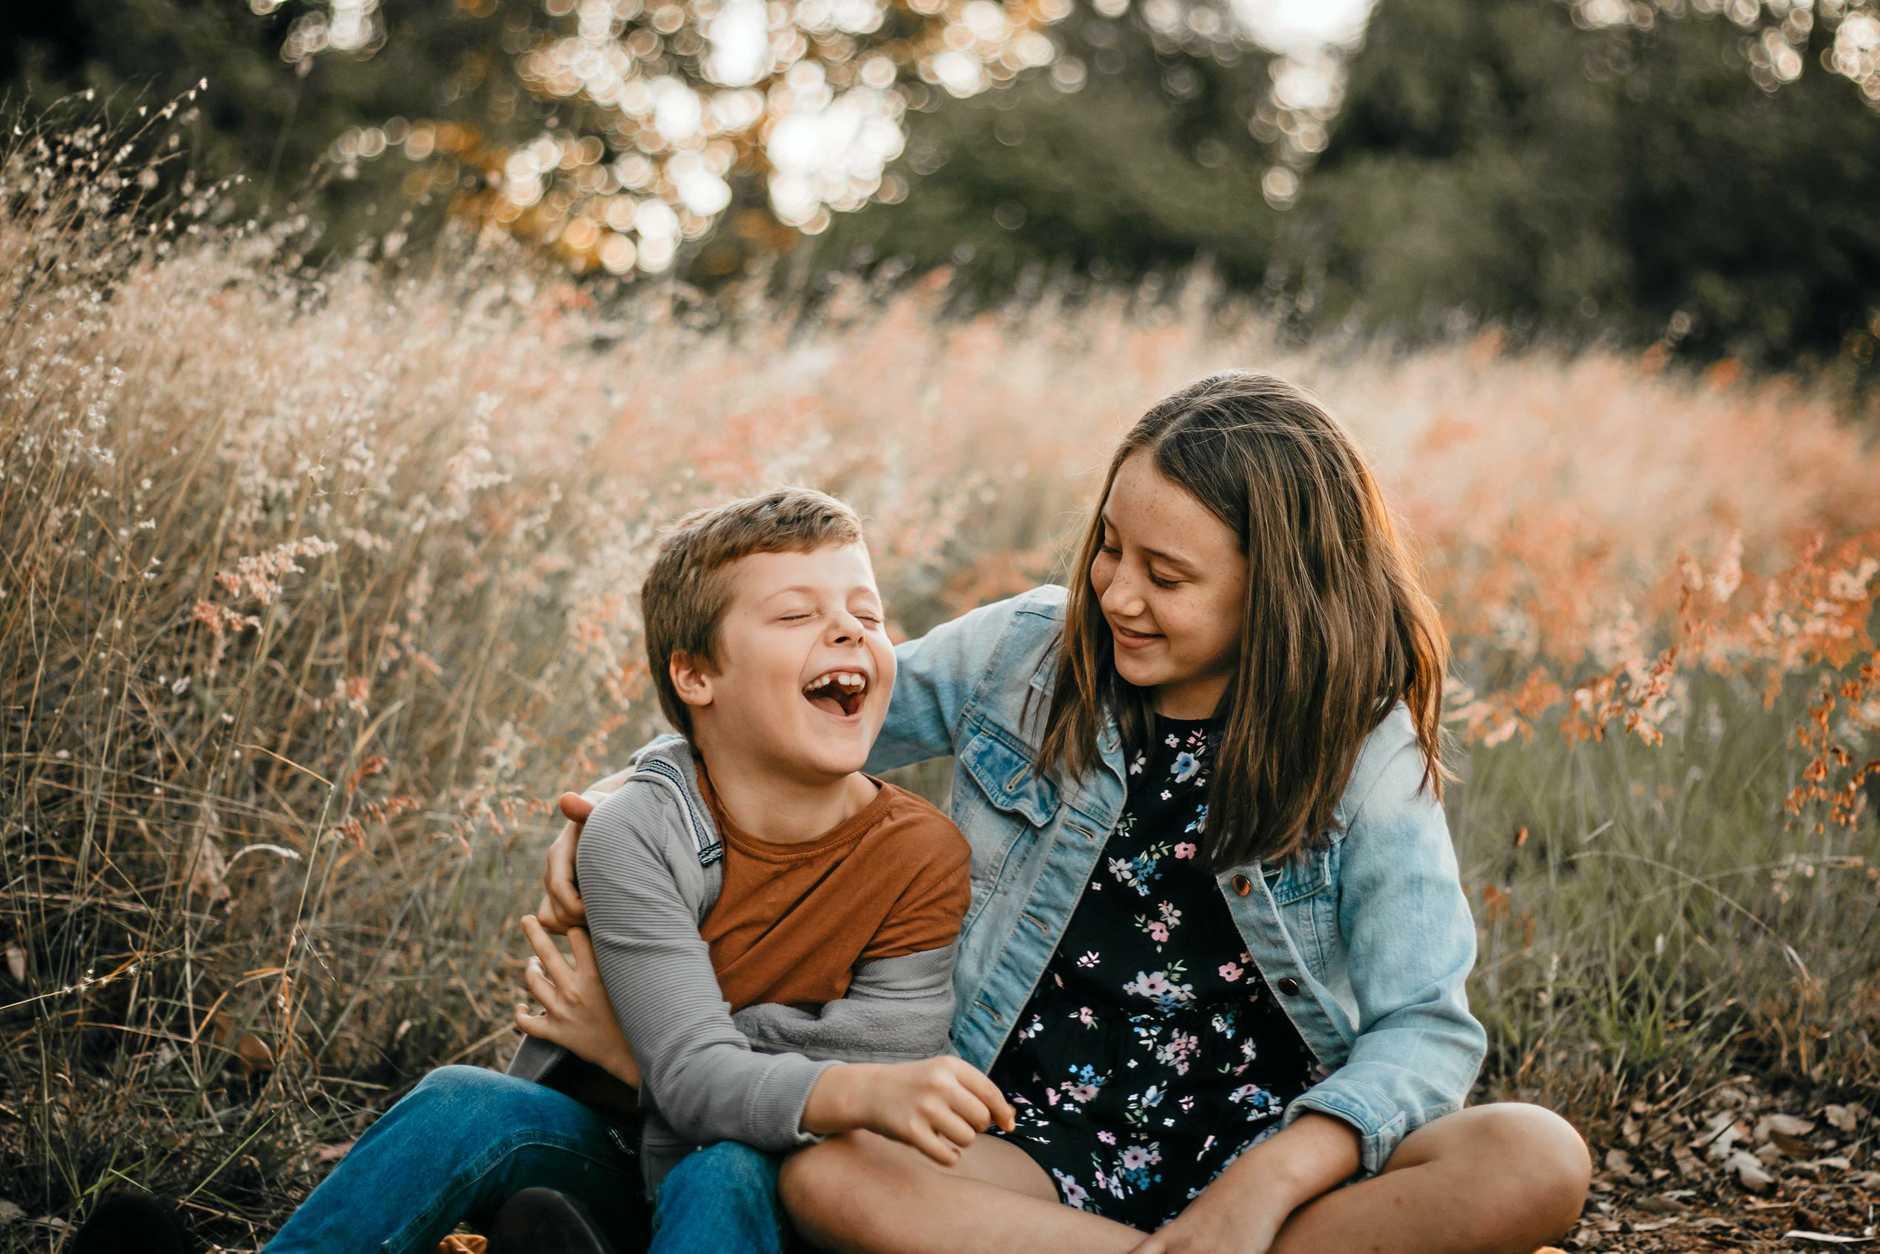 Kristy Champney's daughter Madi Jesberg and her nephew Parker Prain.